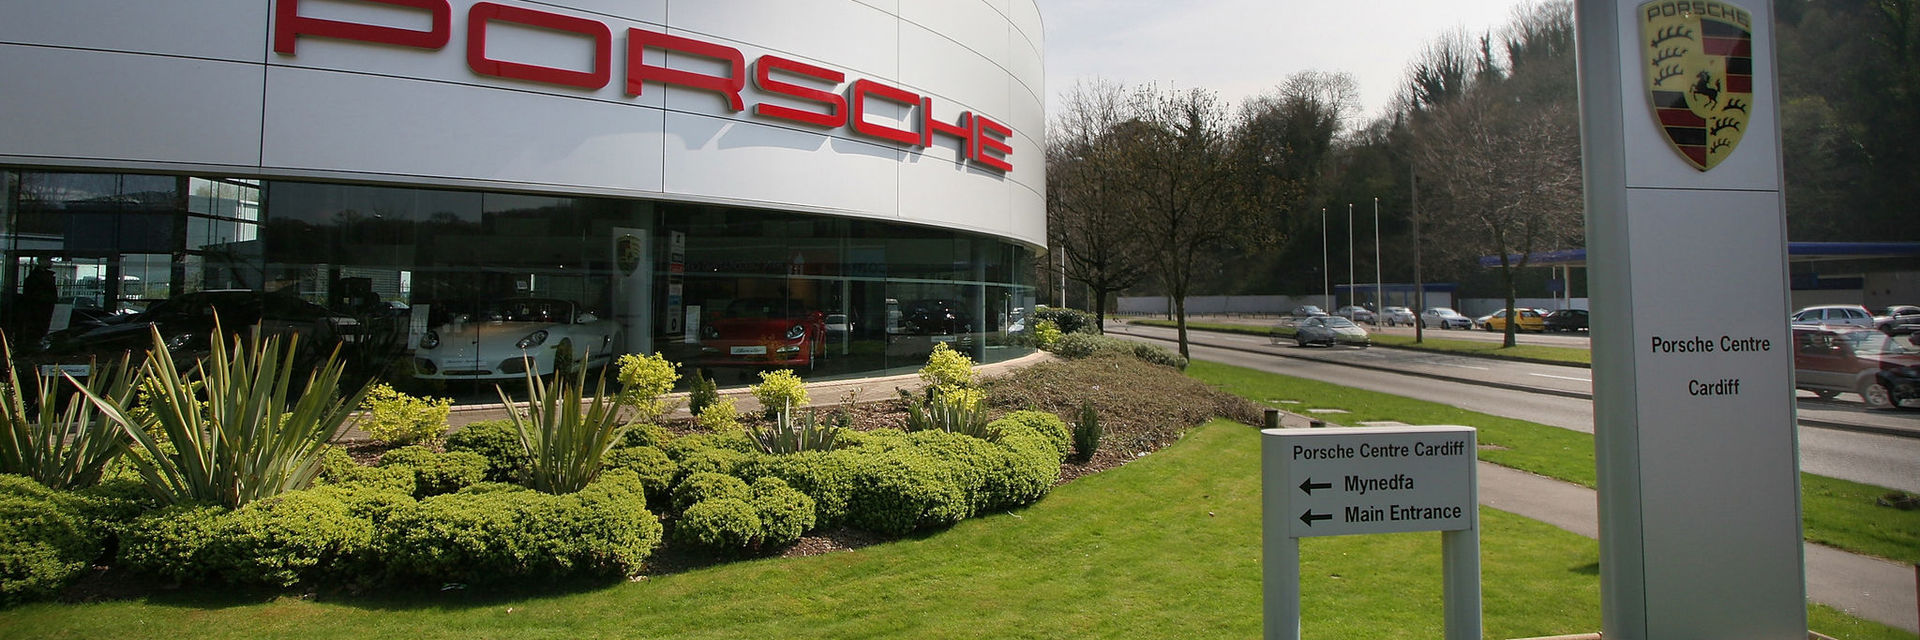 Porsche Centre Cardiff